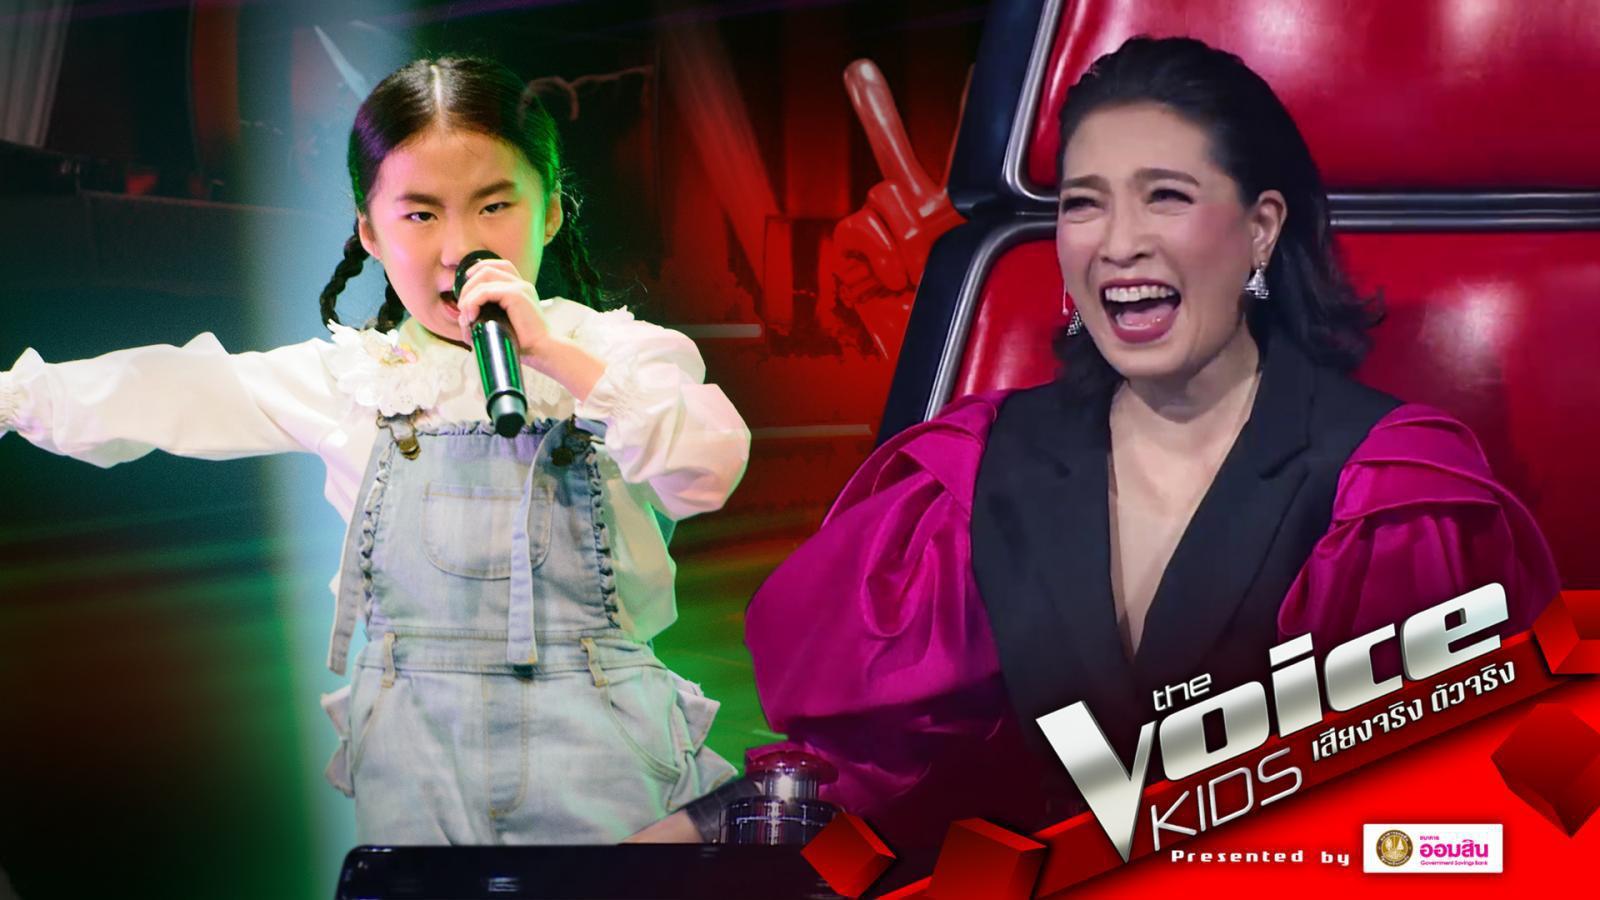 The Voice Kids 2020  Blind Auditions ครั้งที่1   ลีลาน่ารัก จนโค้ชต้องรีบกดหันมาดู!